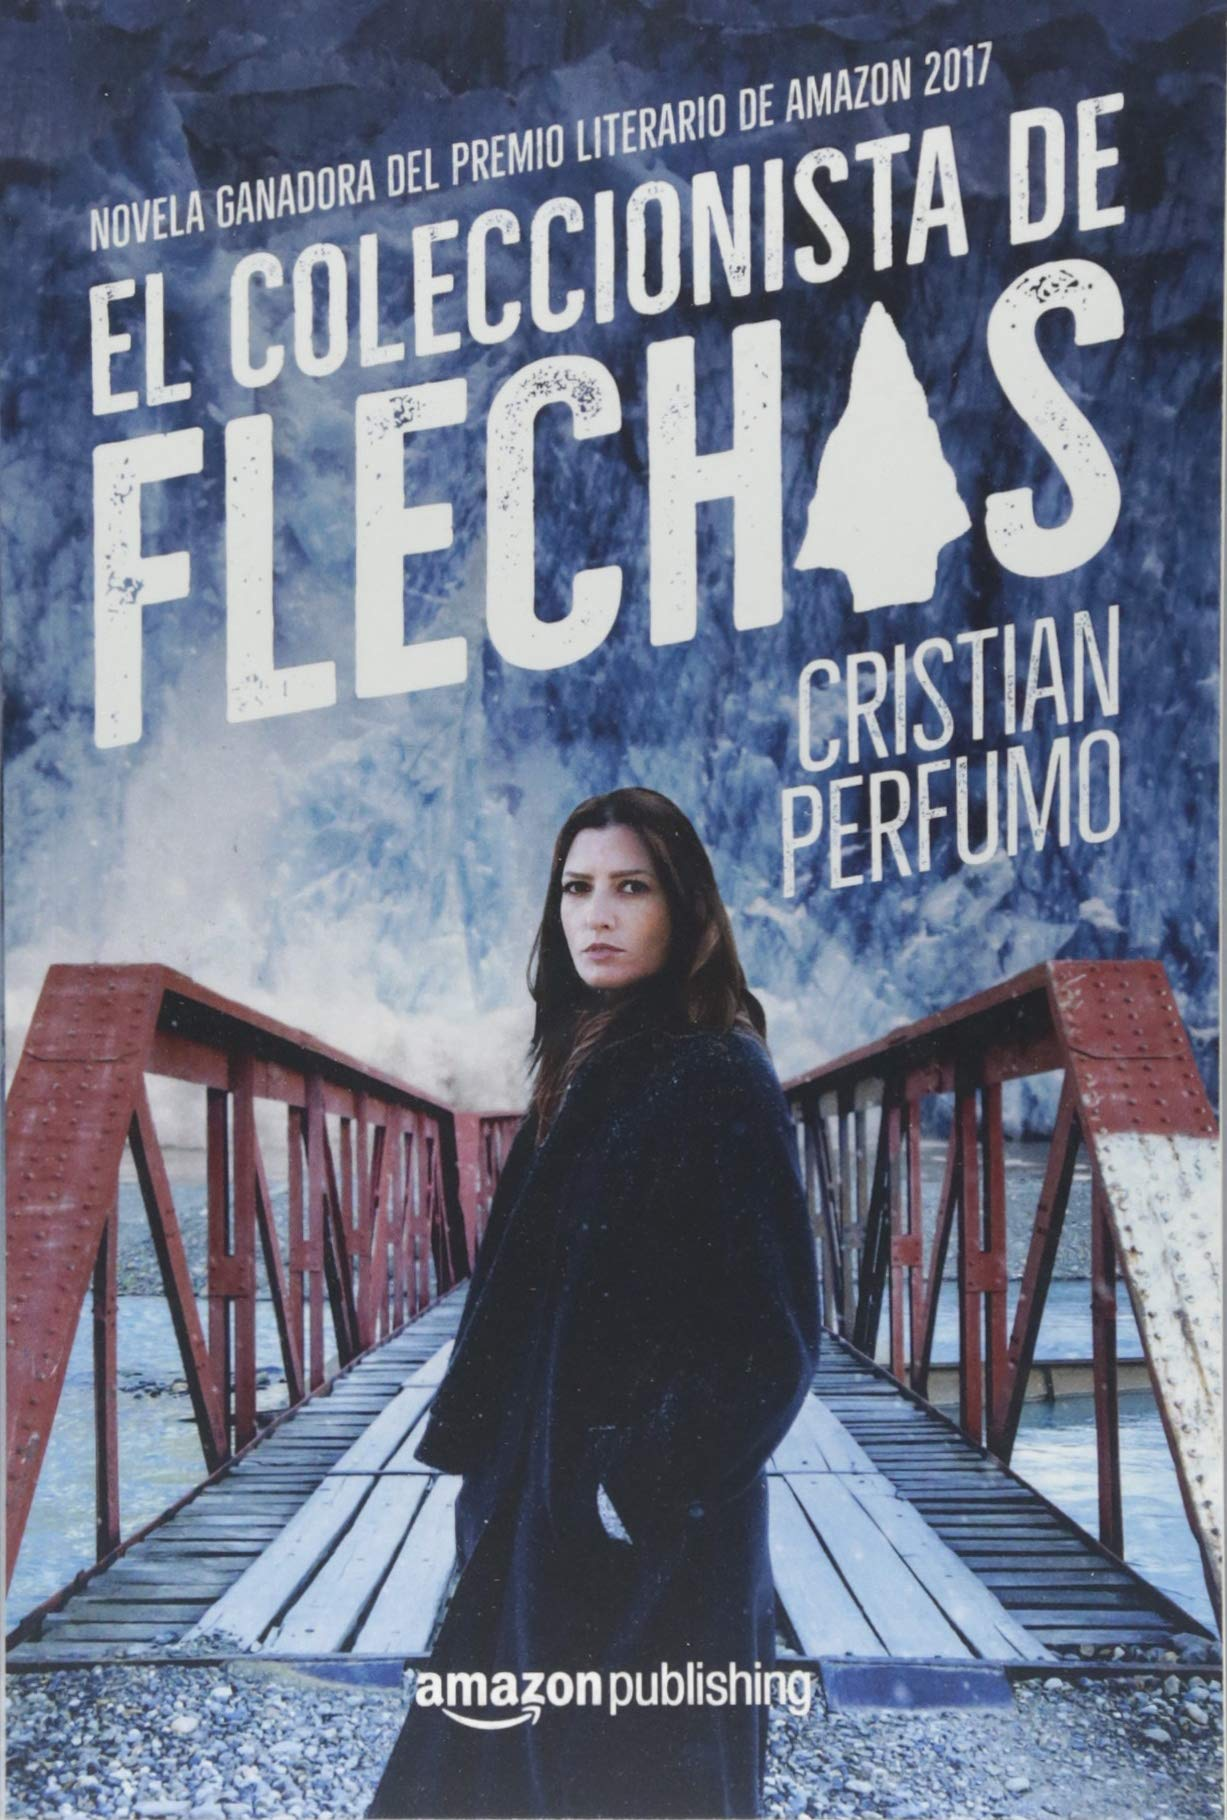 El coleccionista de flechas: Amazon.co.uk: Cristian Perfumo: 9782919800568:  Books